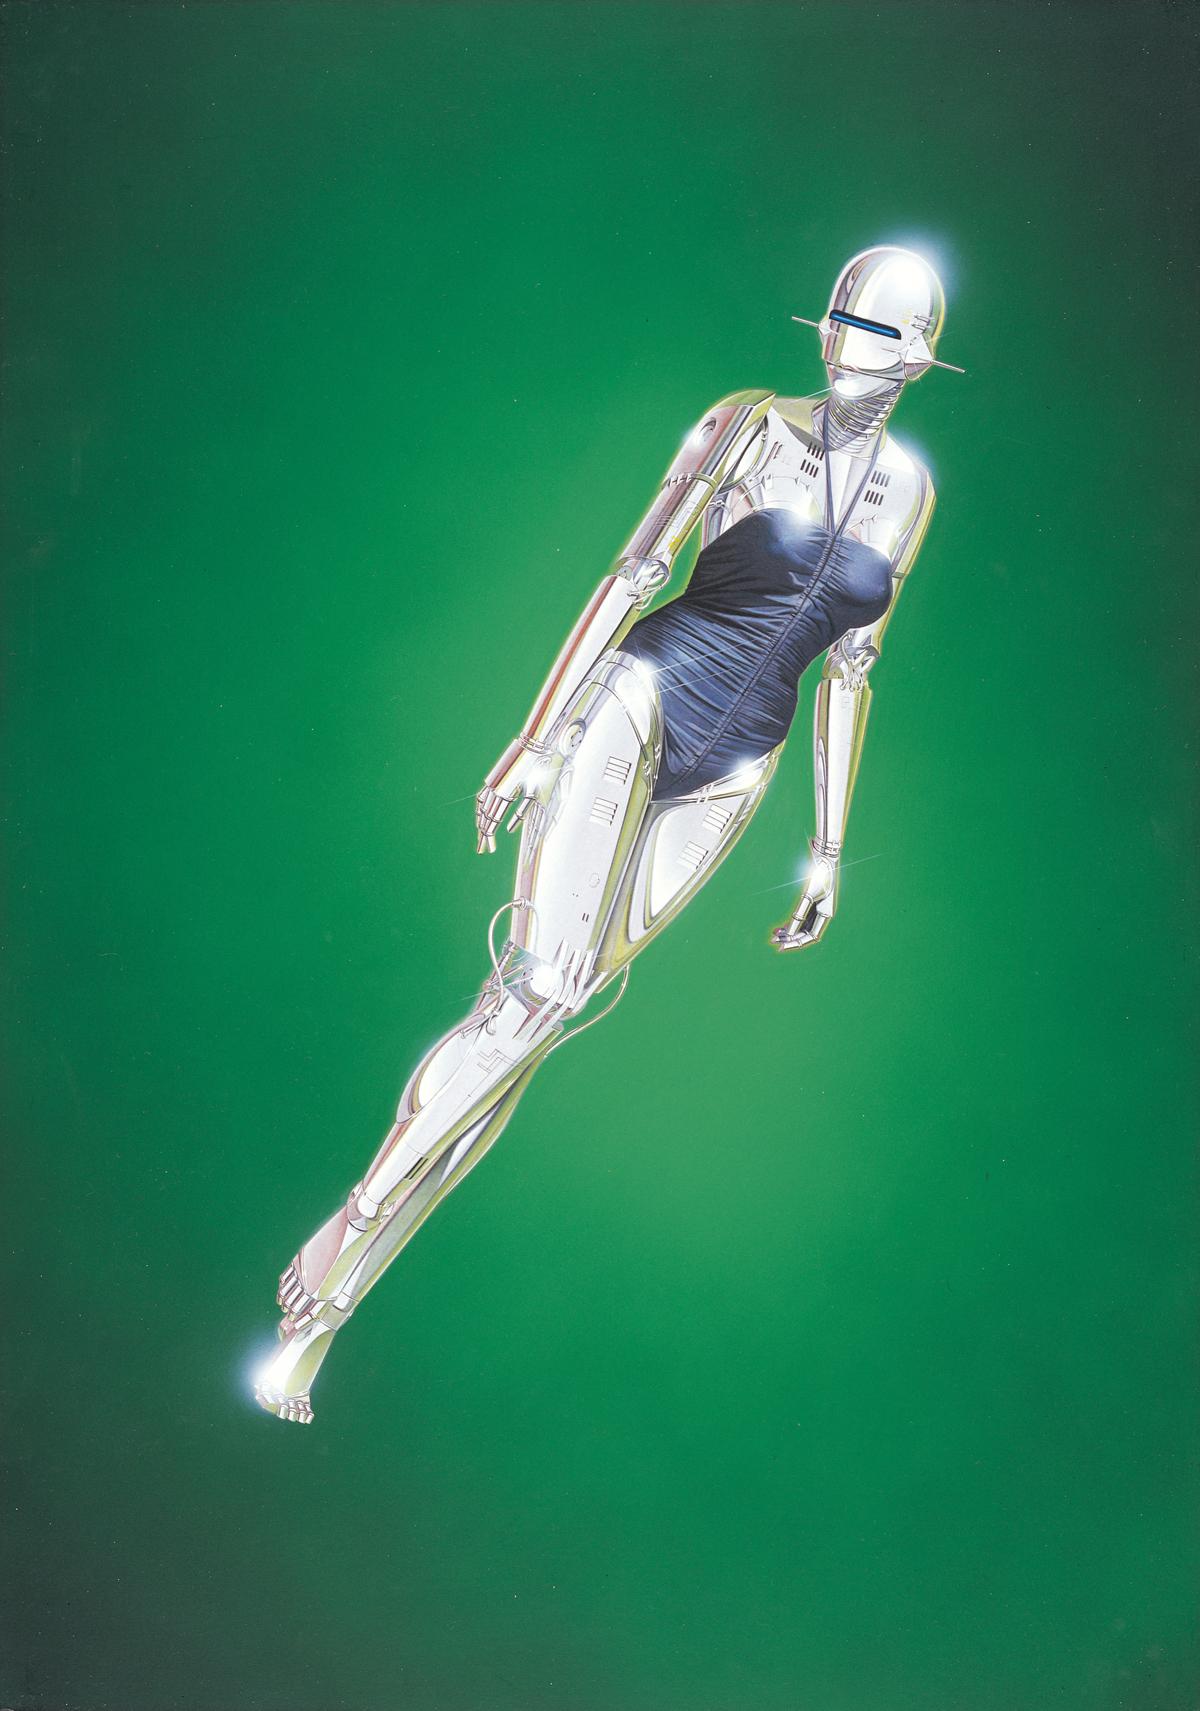 Hajime-Sorayama-Upper-Playground-Fifty24SF-Sexy-Robot-GIGANTES-013